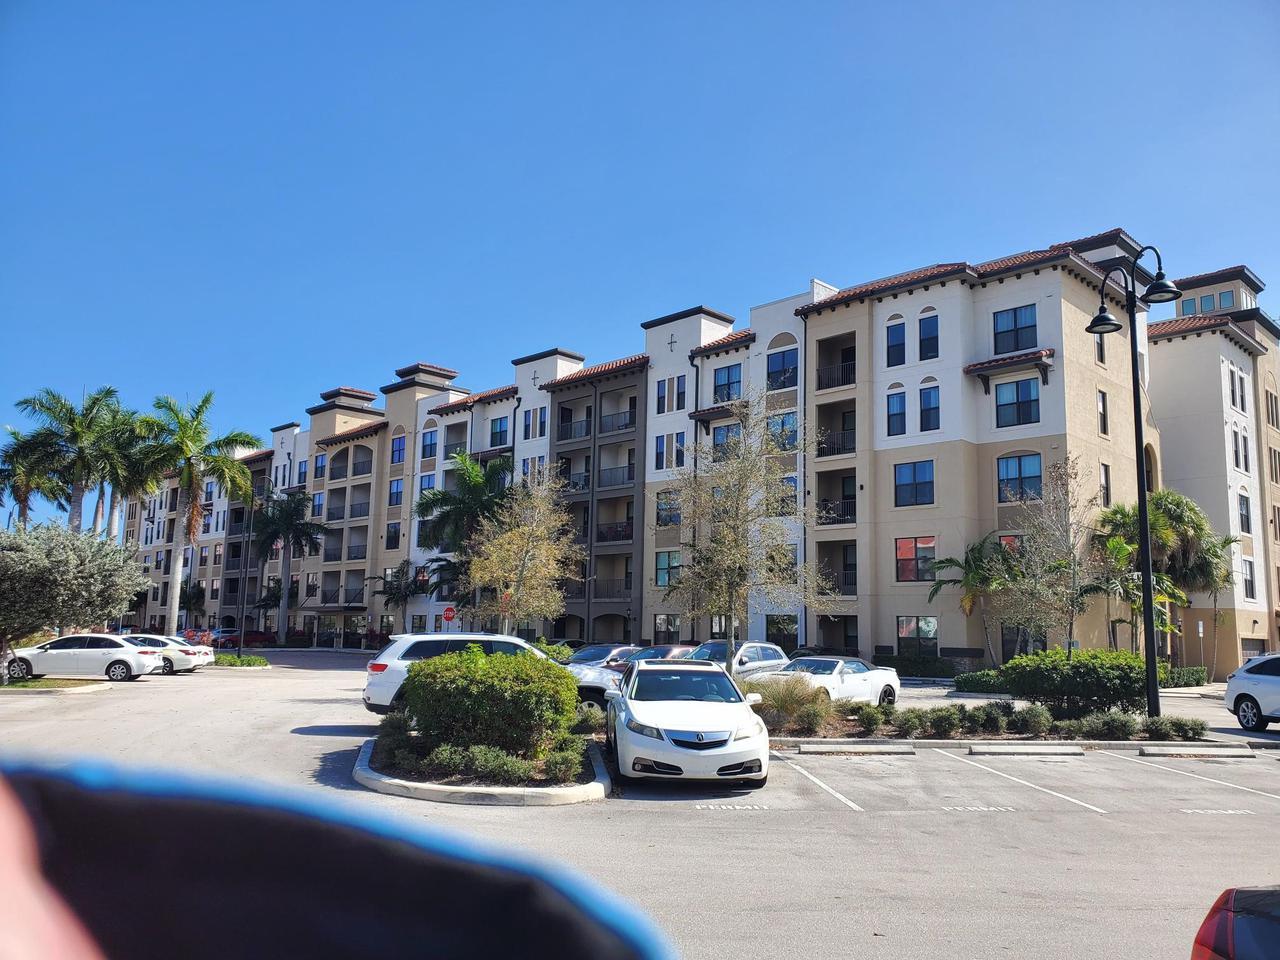 crystal riviera apartments.jpg